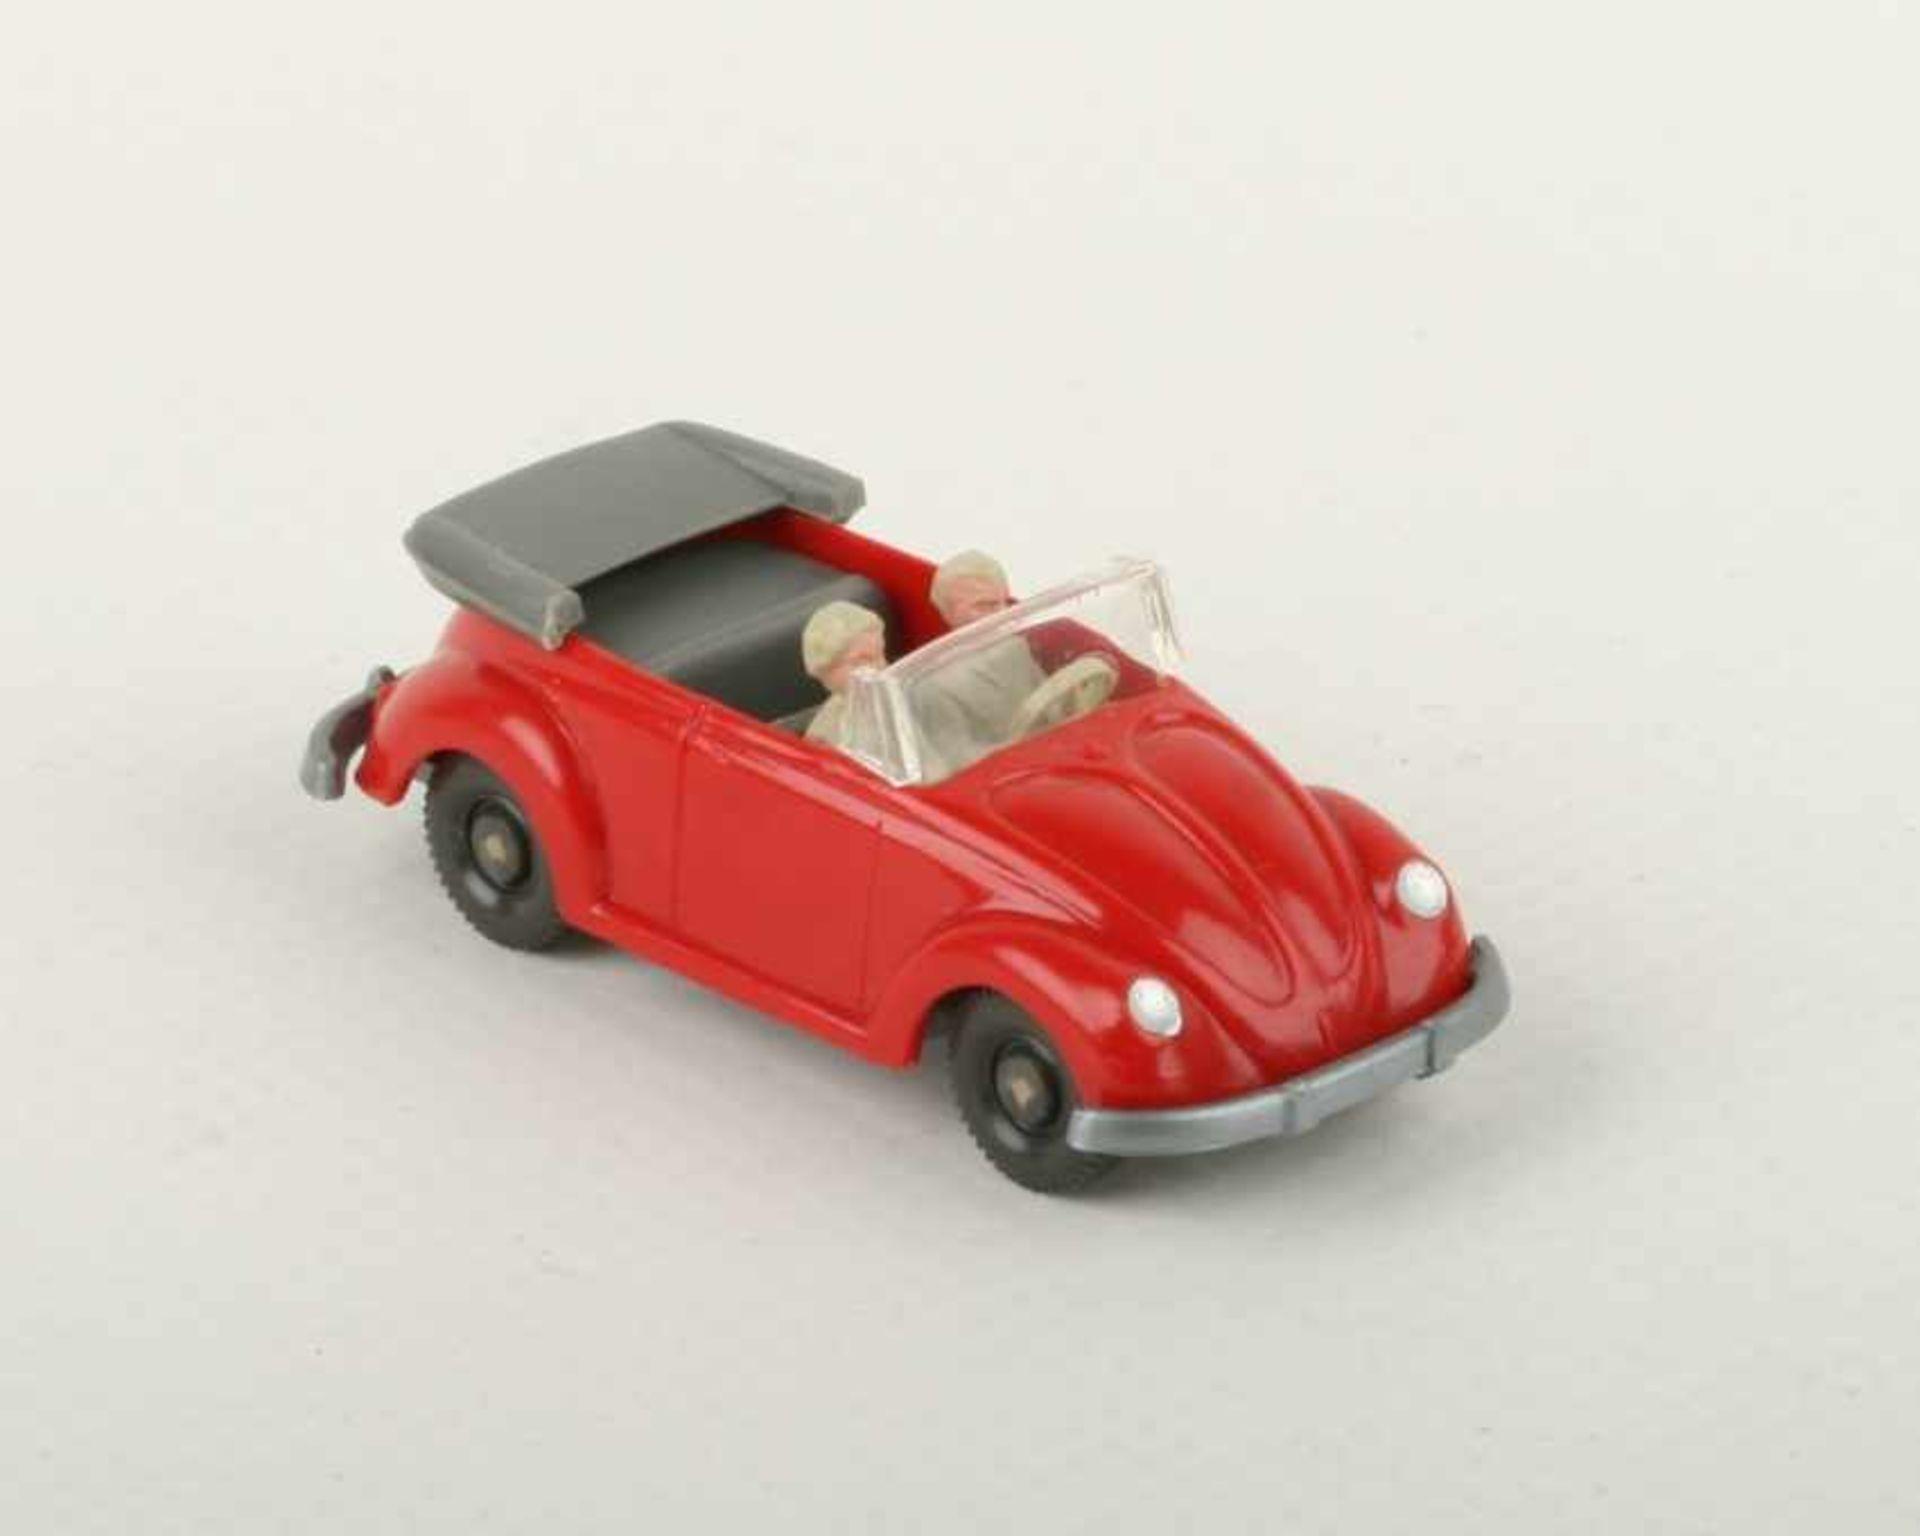 Los 1040 - WikingVW Käfer Cabrio rot33/7f, IE staubgrau, neuwertig